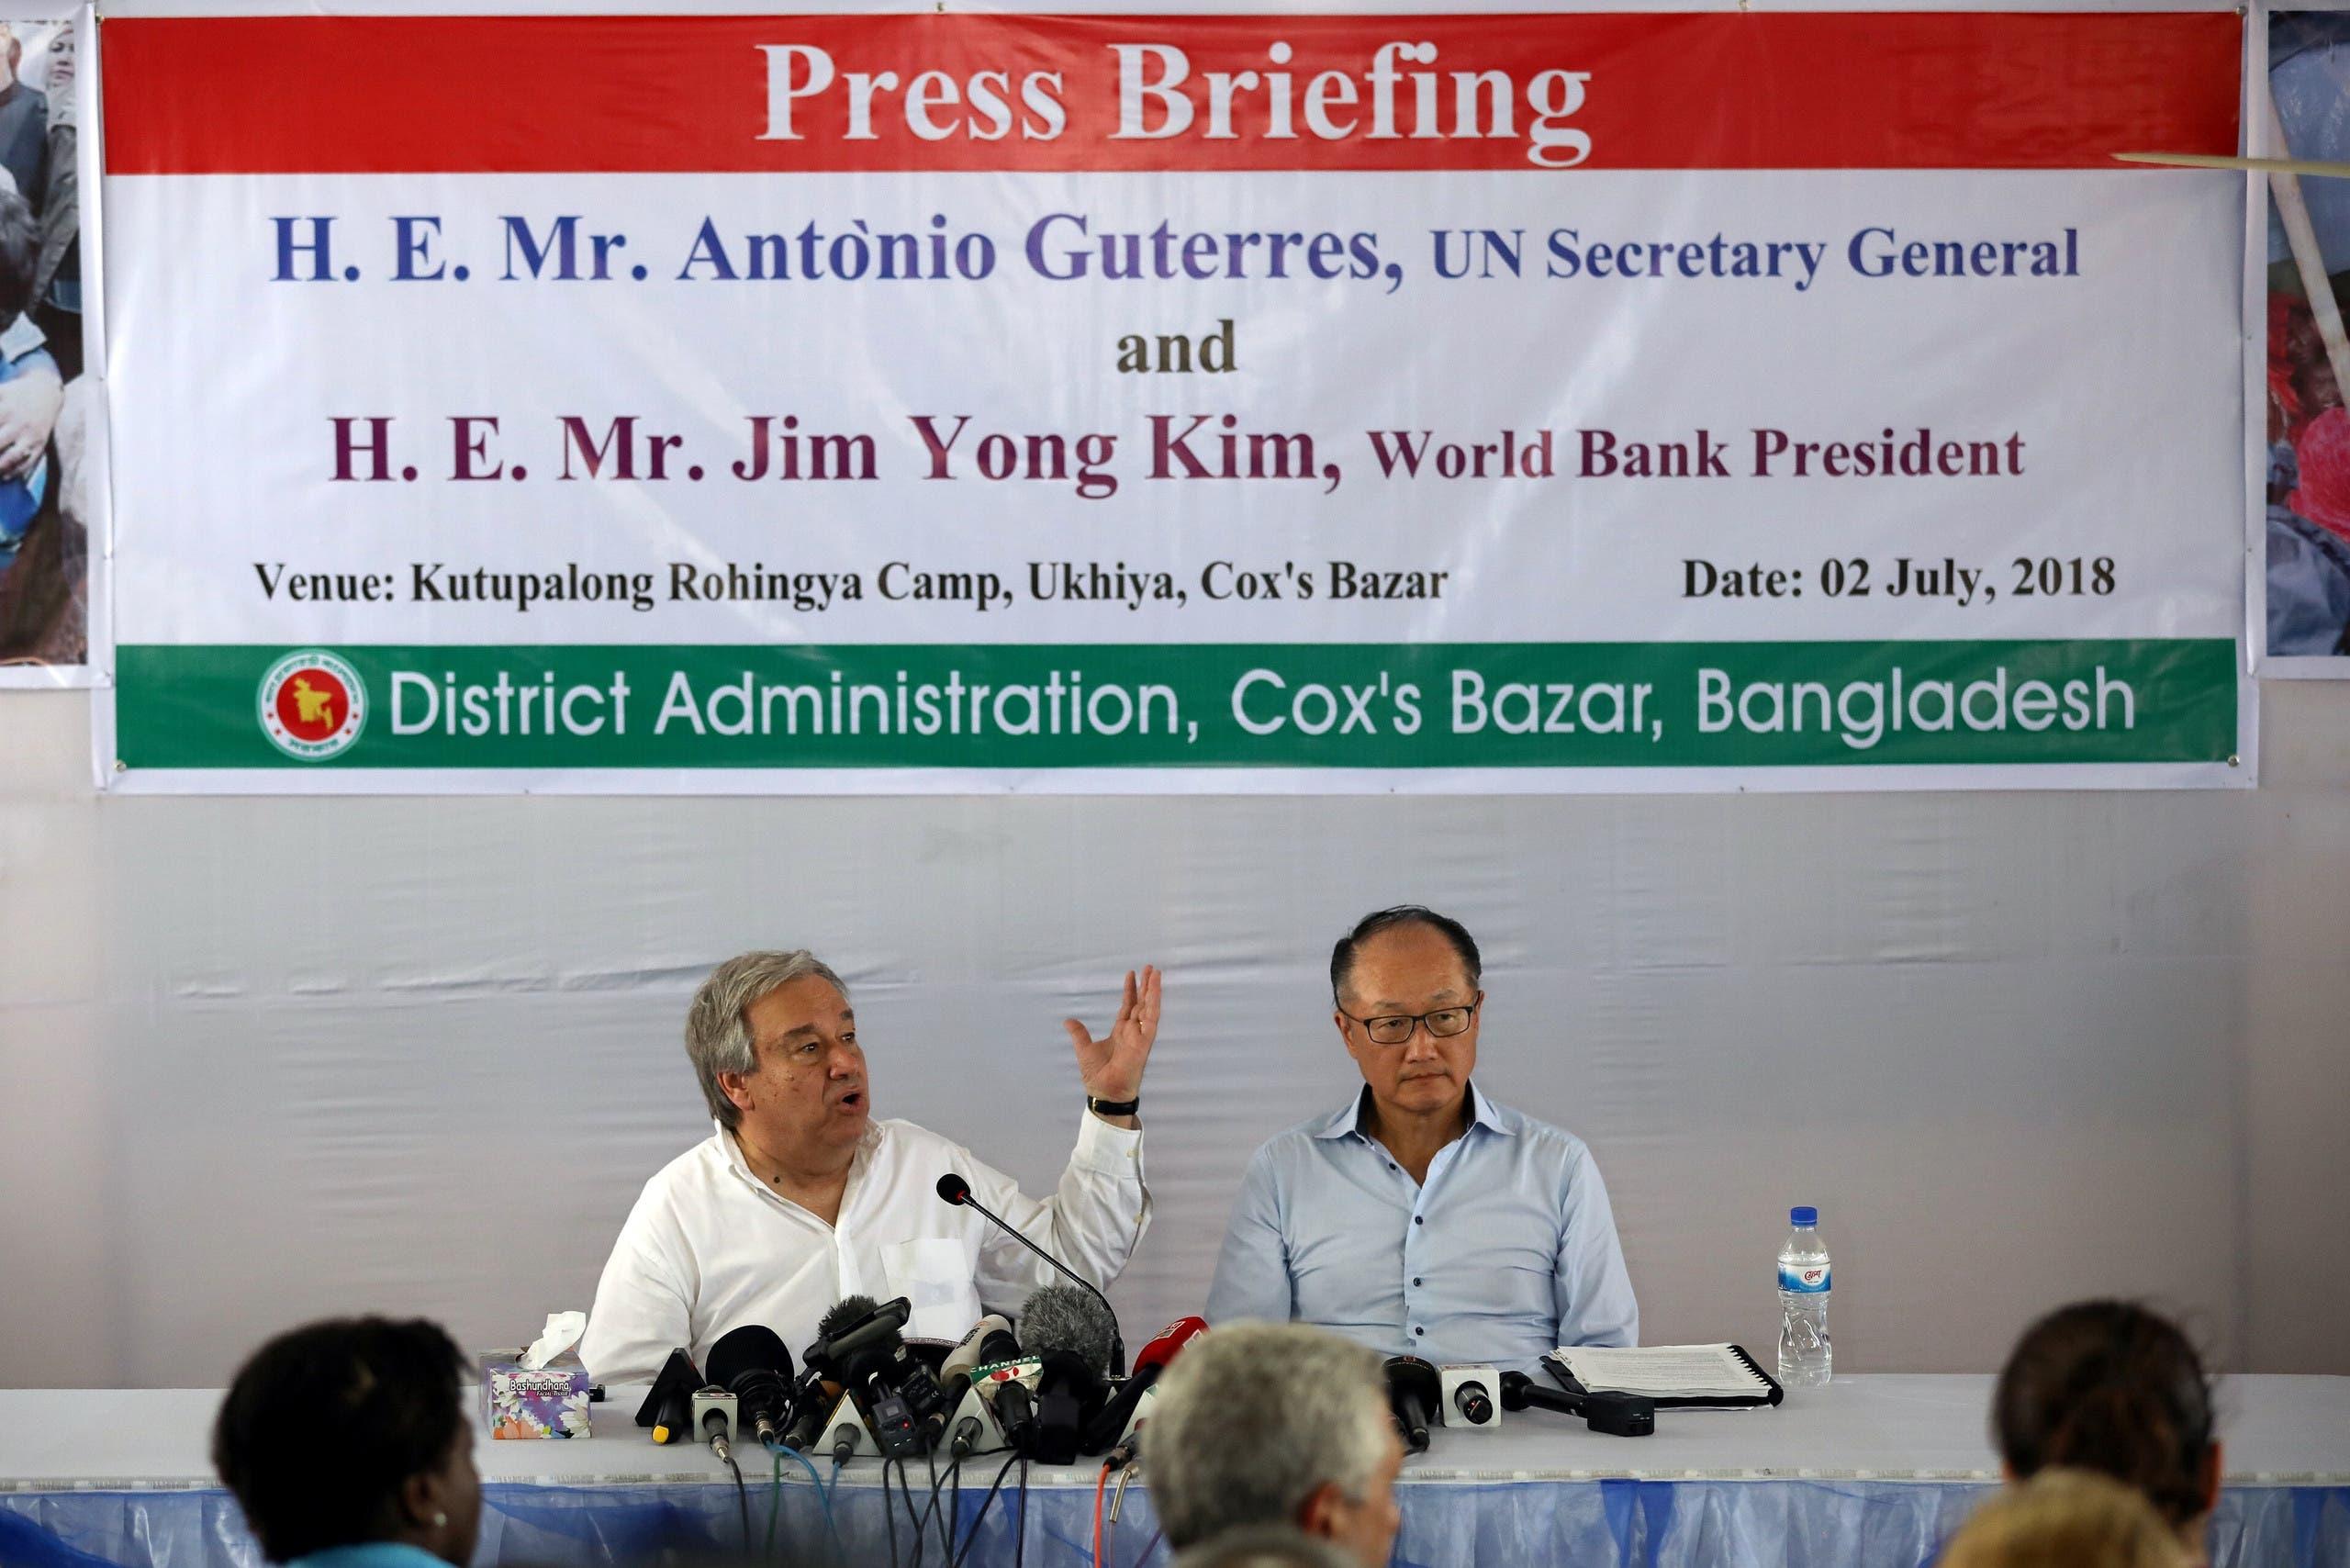 U.N. Secretary General Antonio Guterres and World Bank president Jim Yong Kim attend a press briefing at the Kutupalong refugee camp in Cox's Bazar, Bangladesh, July 2, 2018. REUTERS